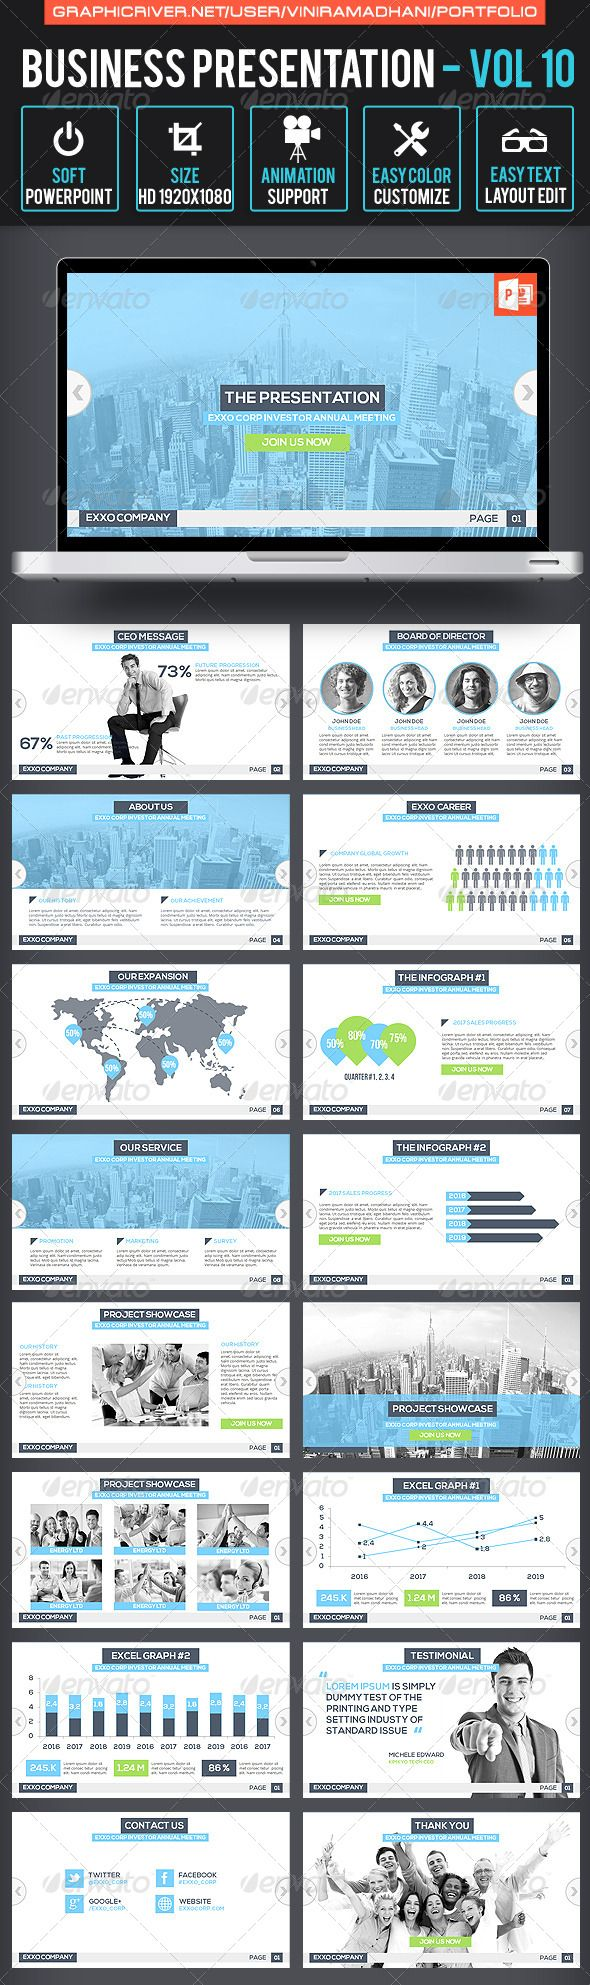 Business Presentation | Volume 10 - Business Powerpoint Templates